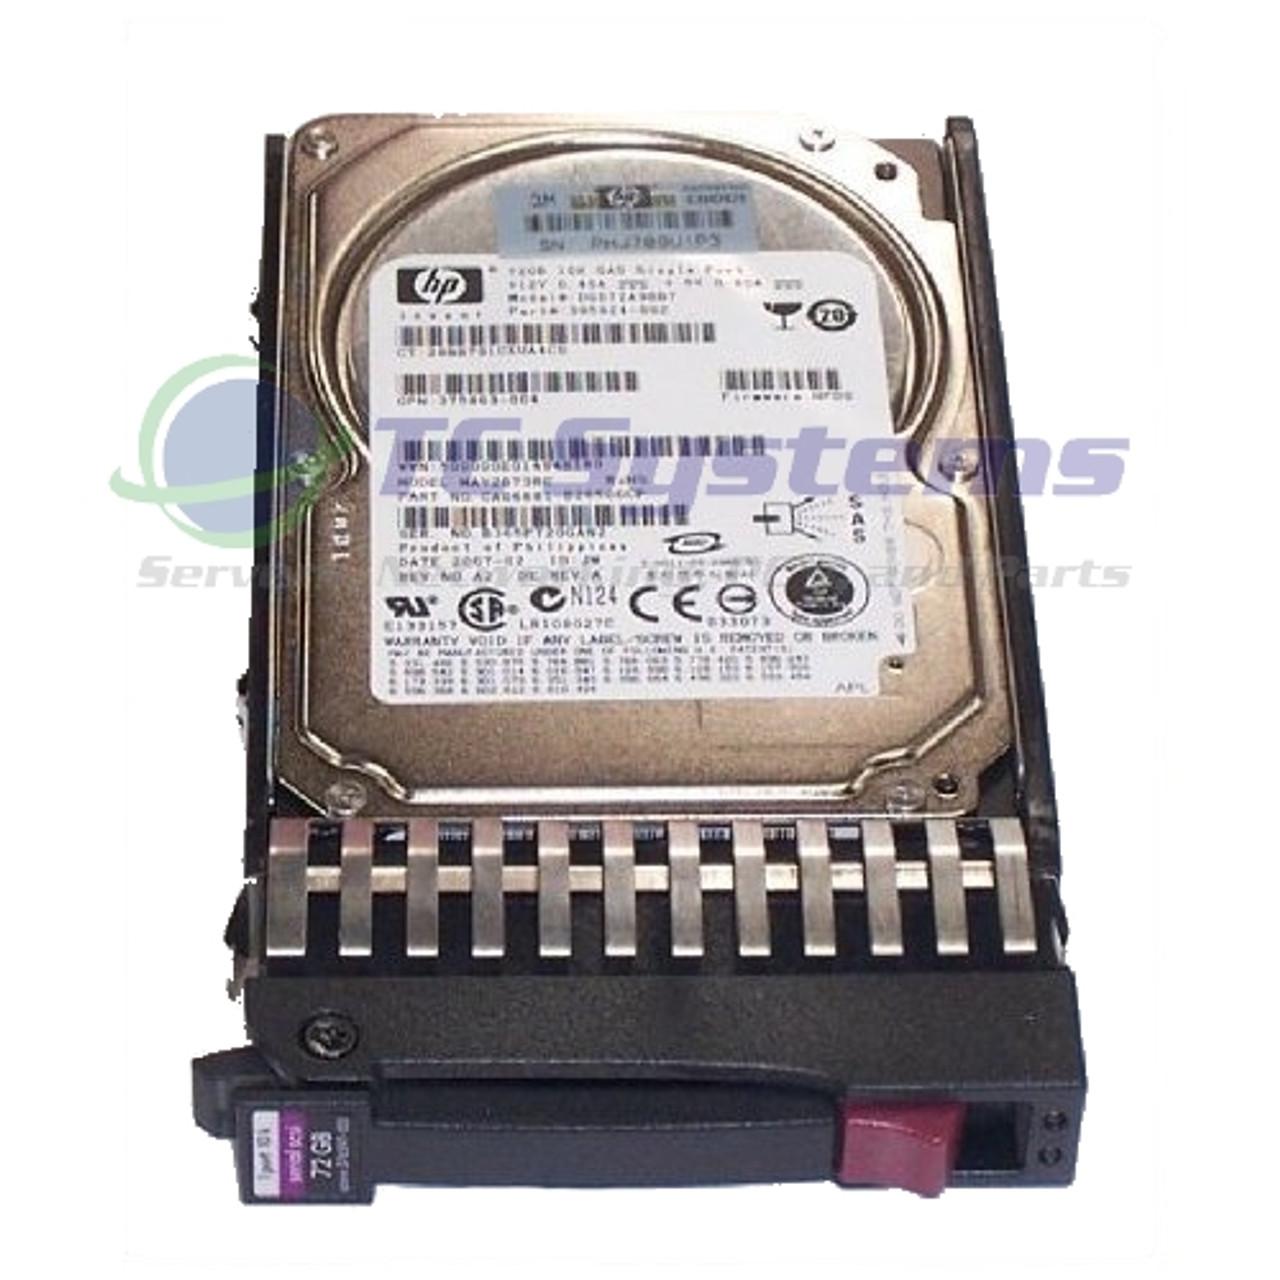 HP 376597-001